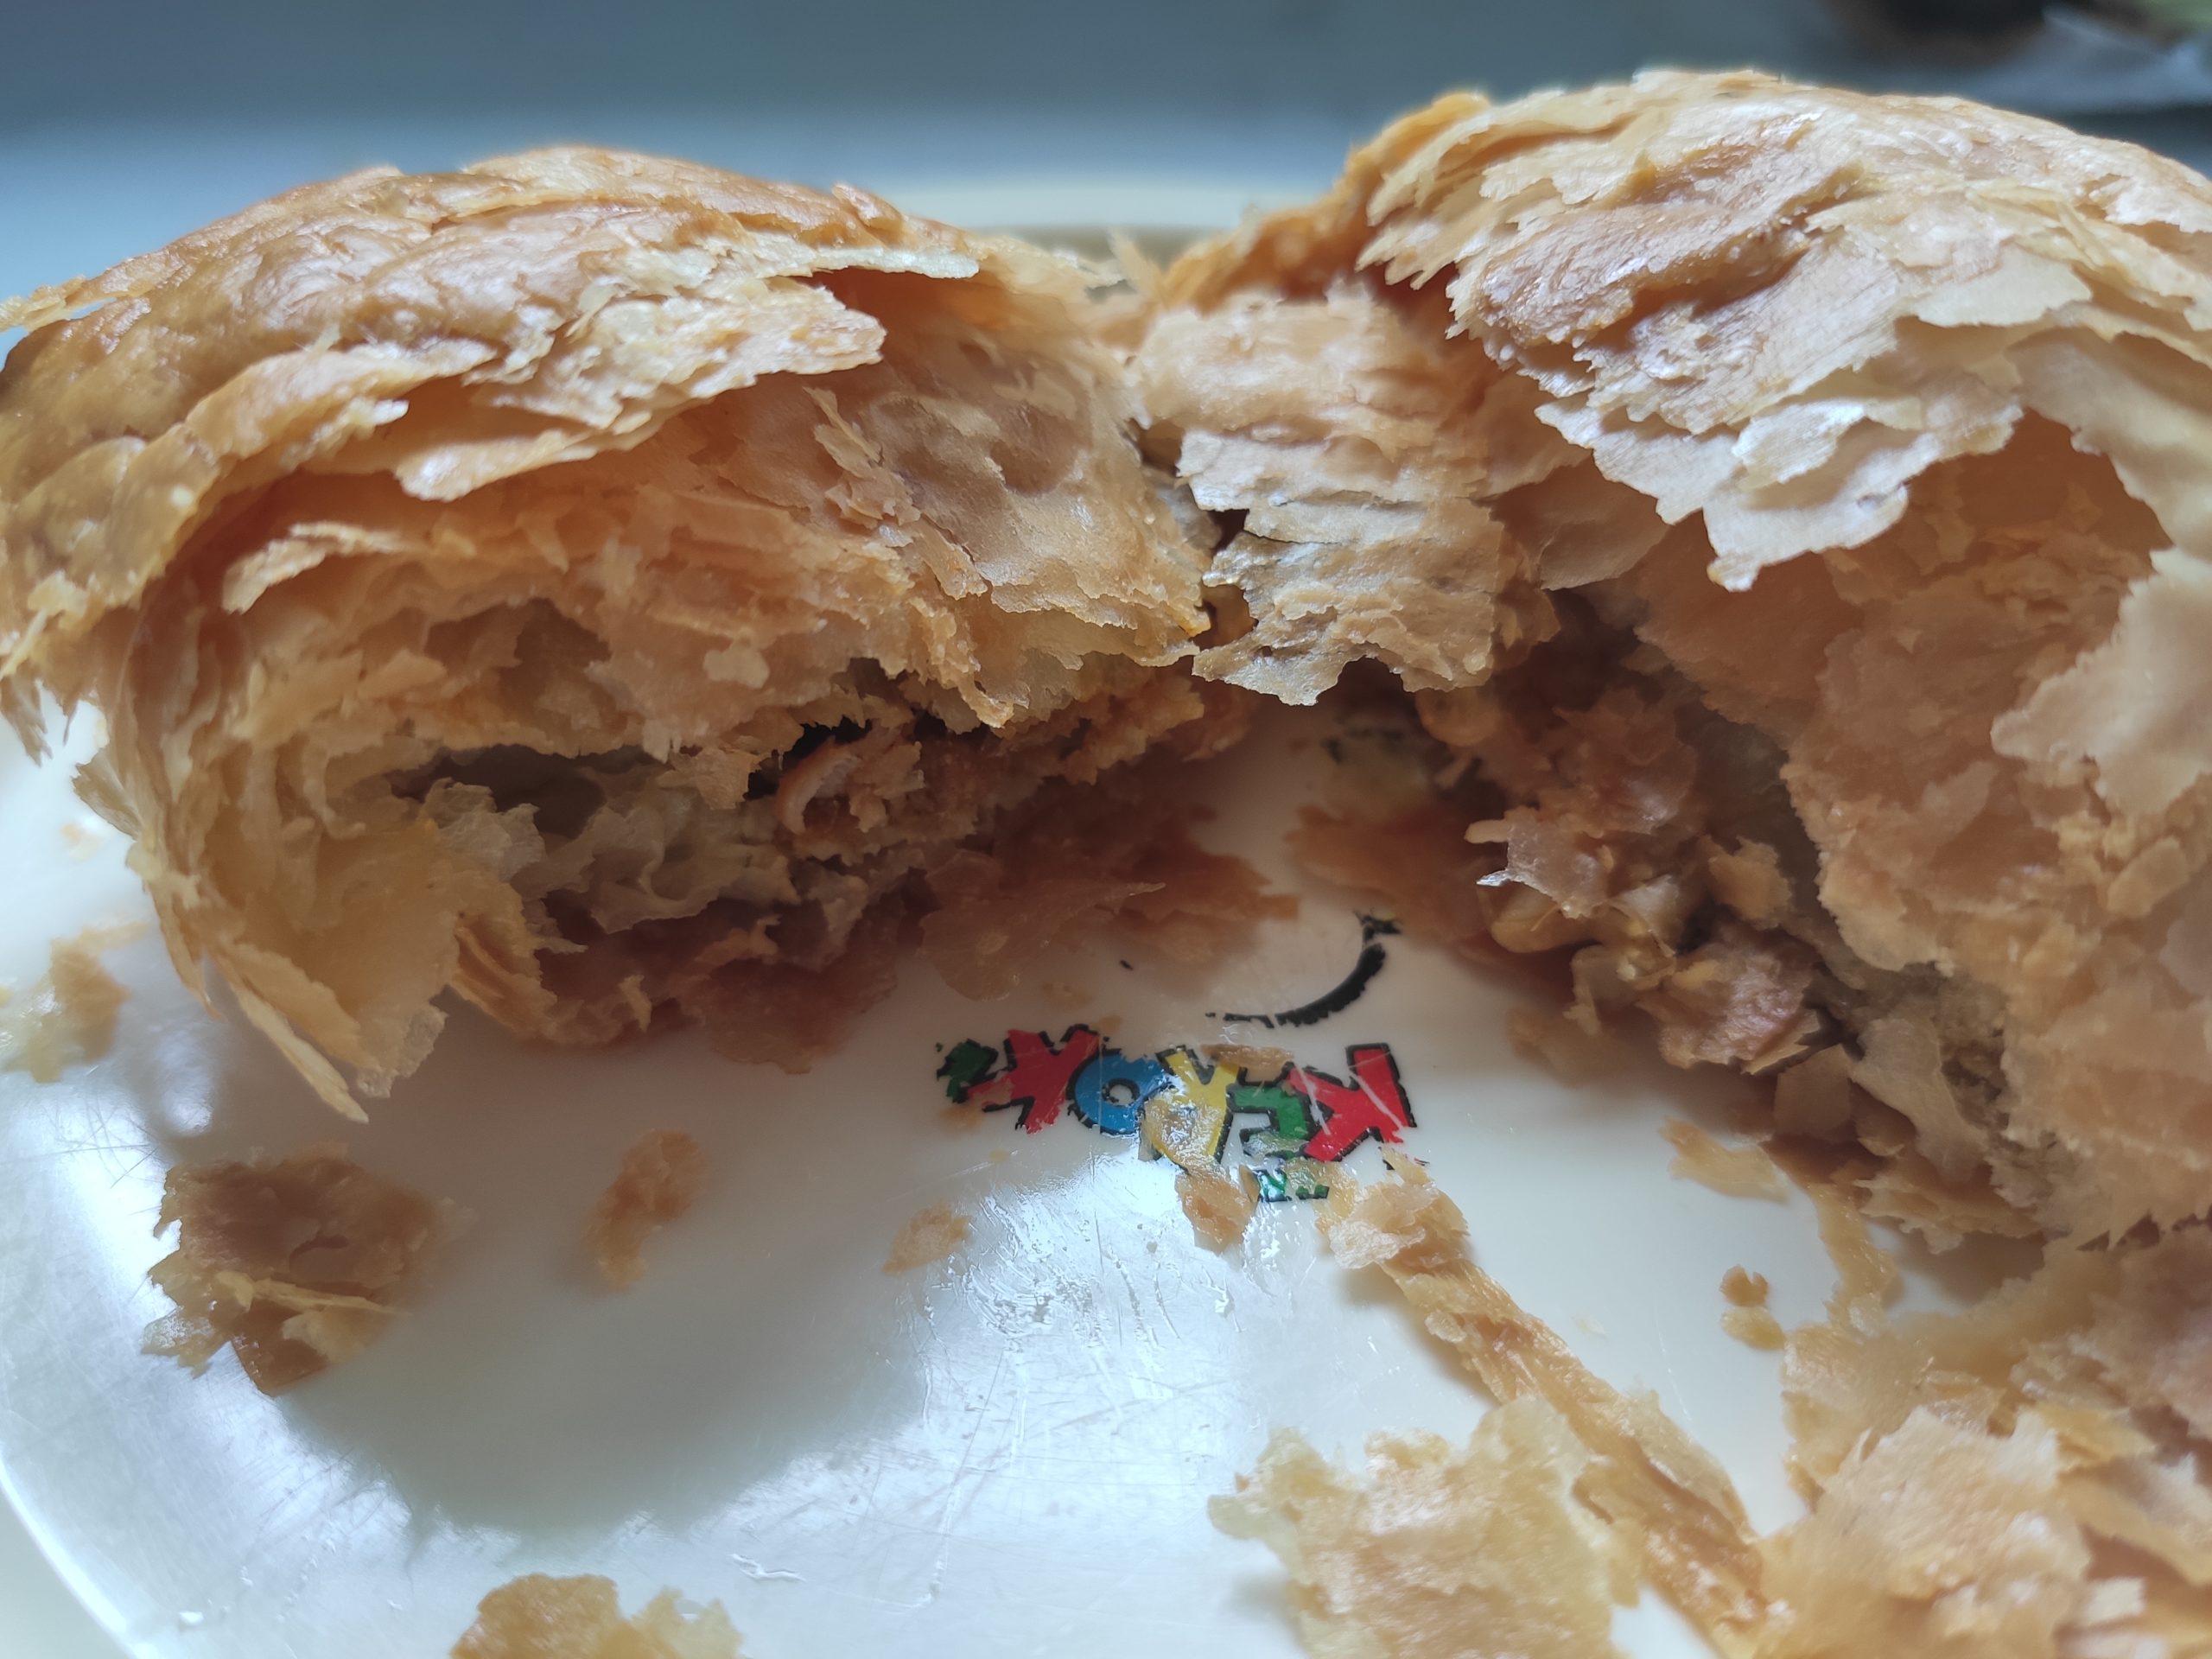 [Review] Polar Puffs & Cakes @ Singapore